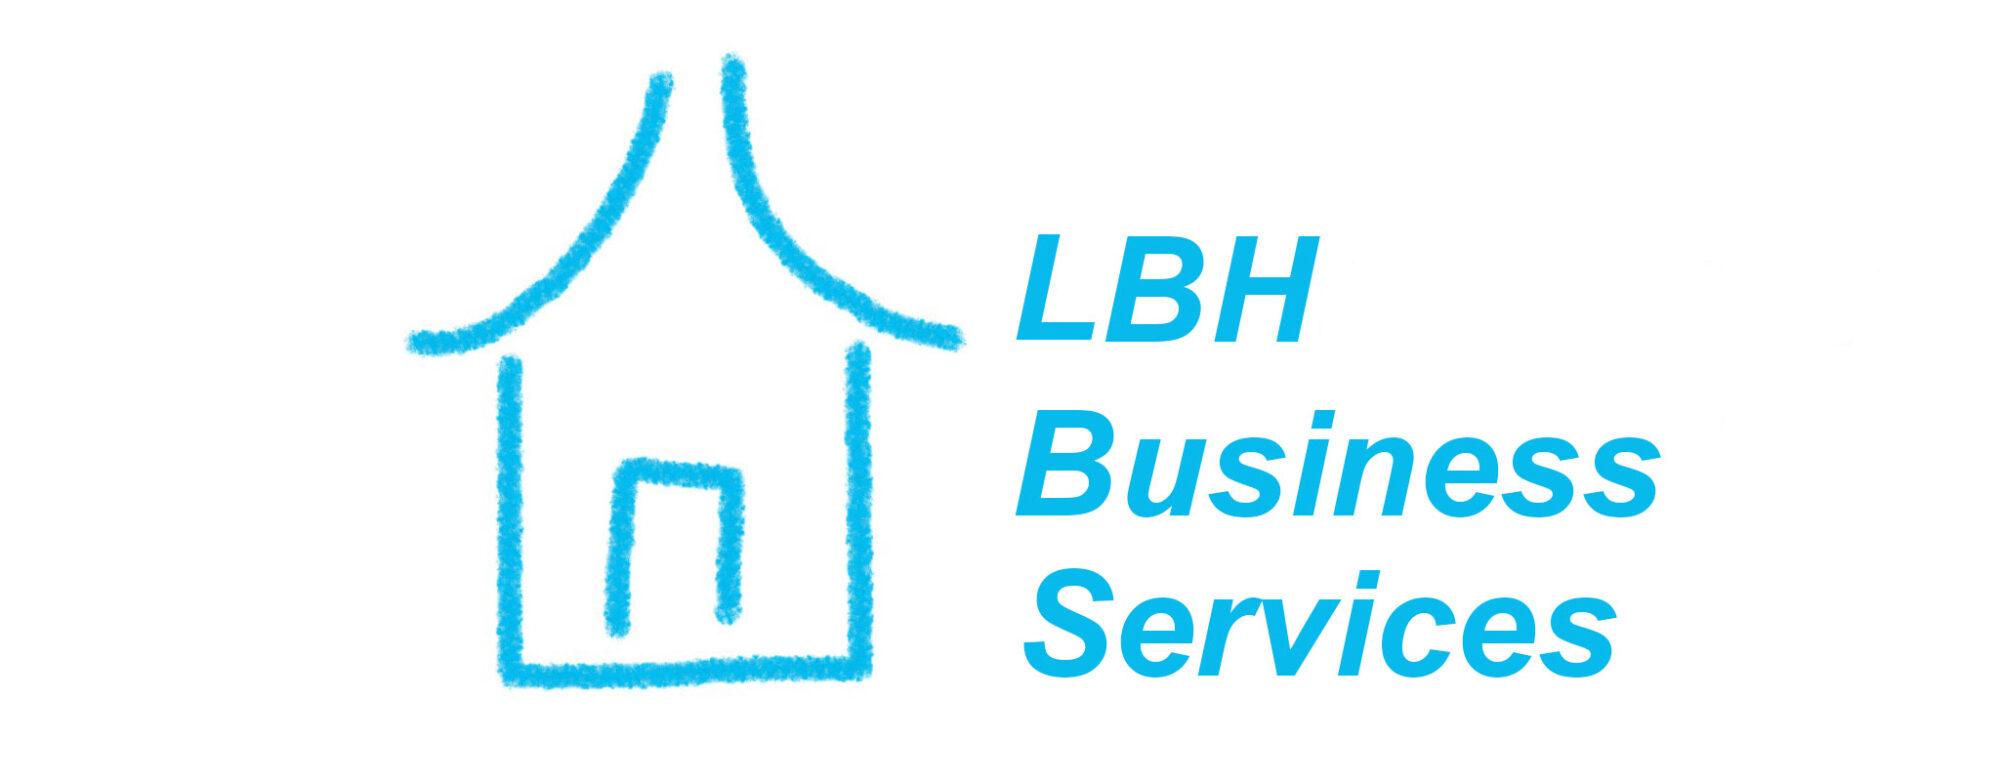 LBH Business Services blue house logo